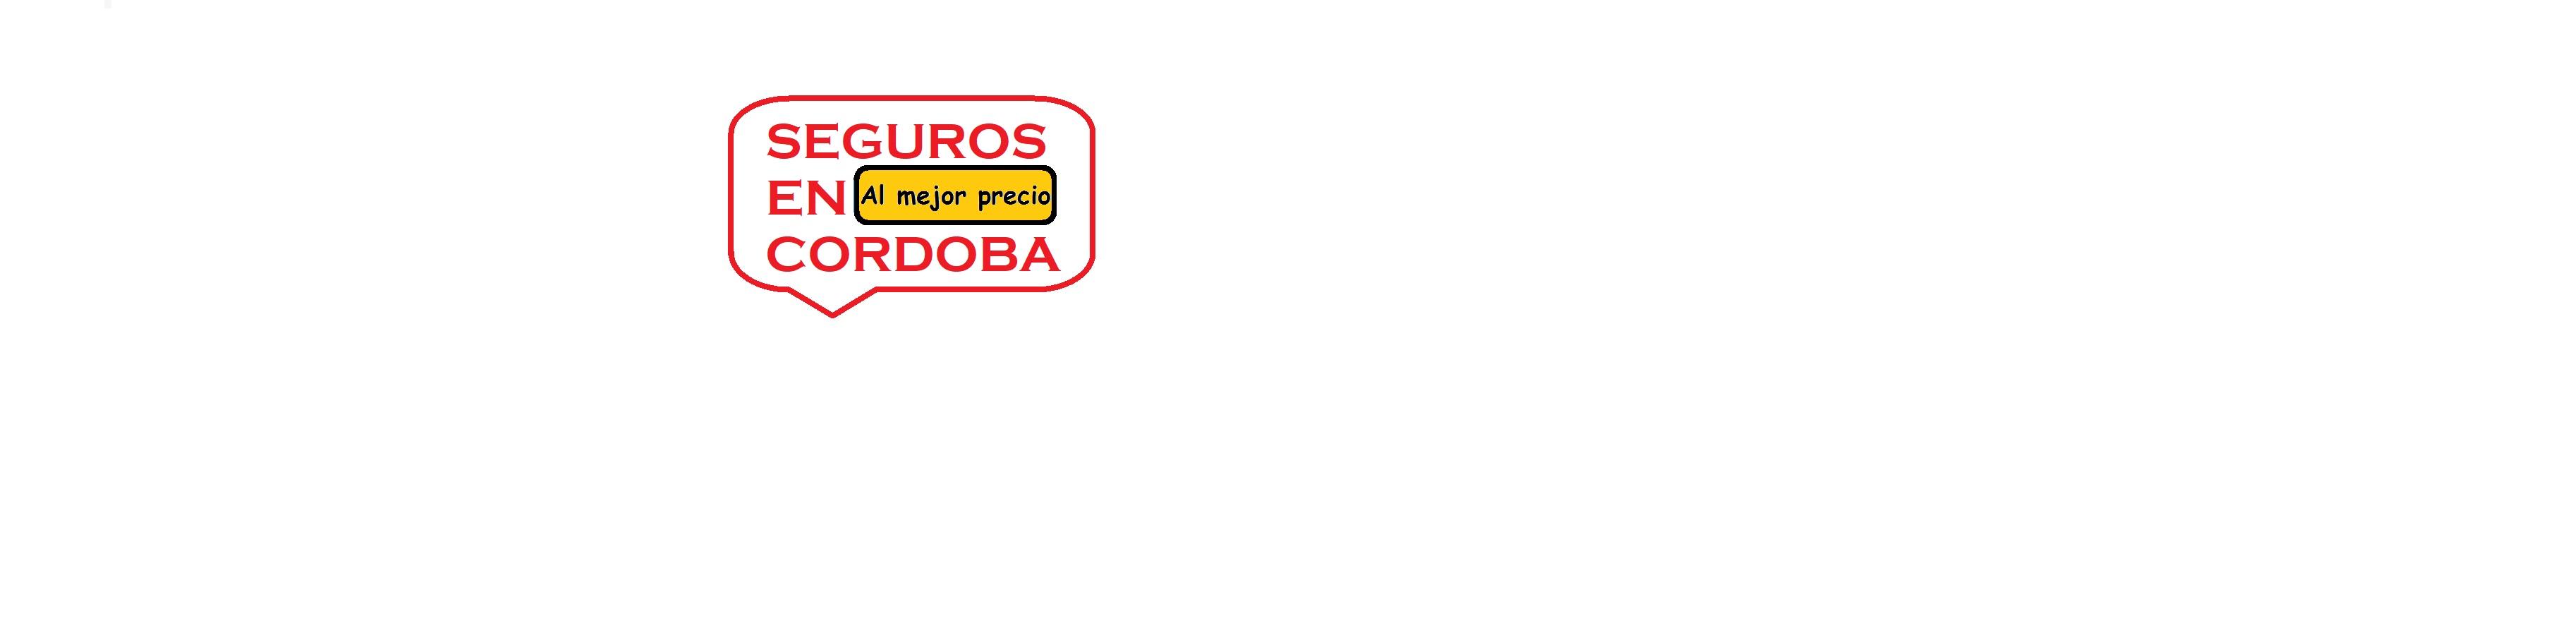 Seguros en Cordoba - Agencia de Seguros - Corredores de Seguros - AL MEJOR PRECIO GARANTIZADO